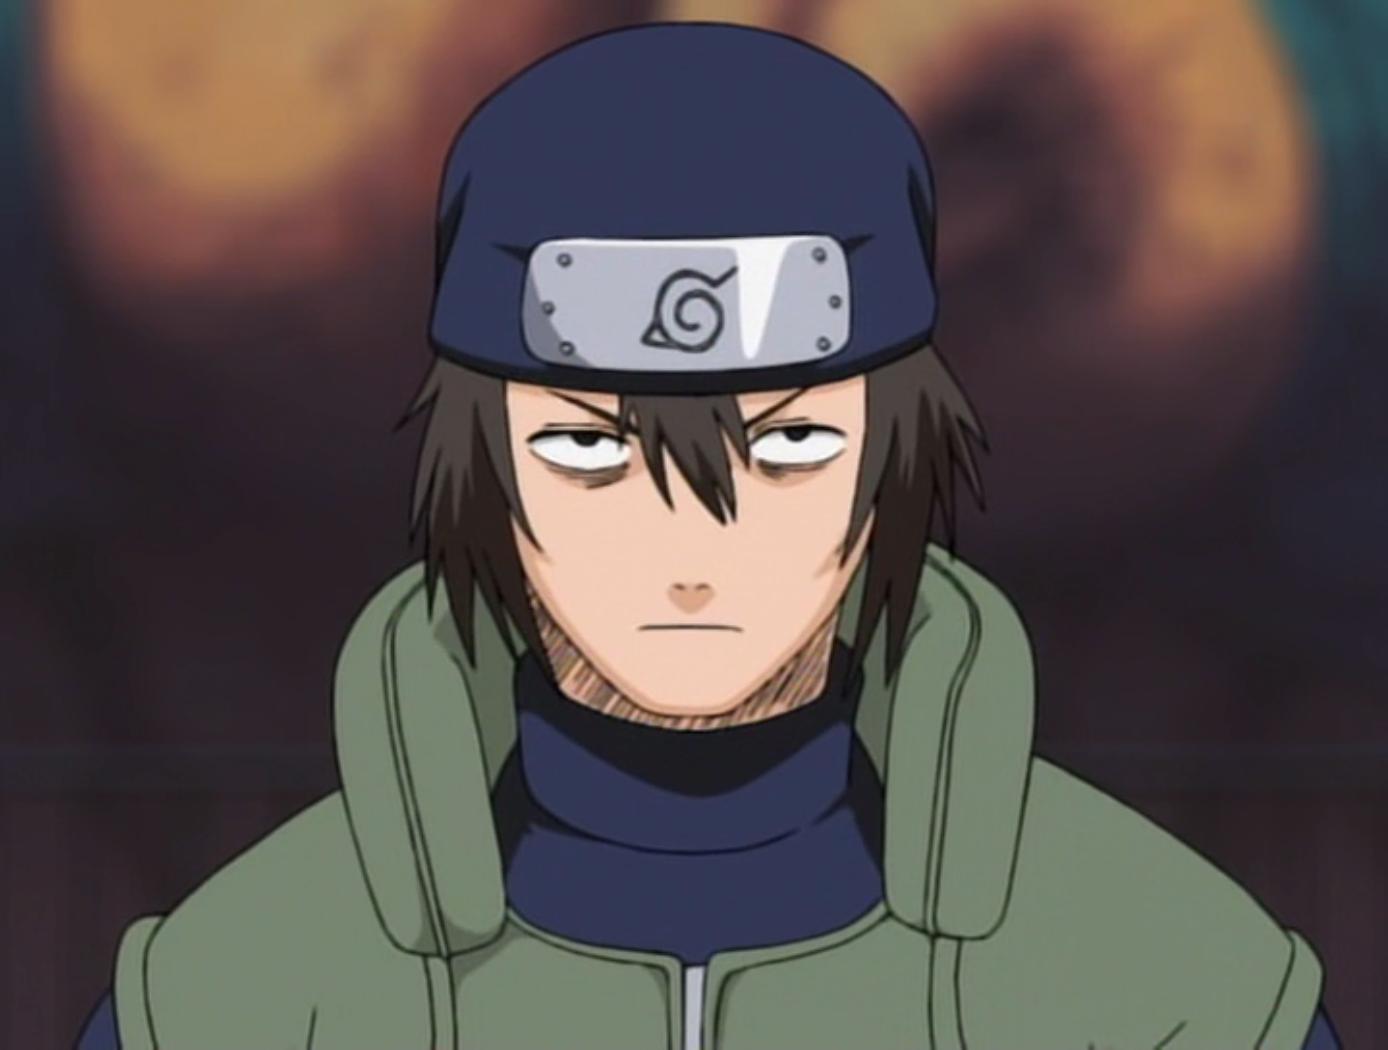 Hayate Gekkō   Narutopedia   FANDOM powered by Wikia